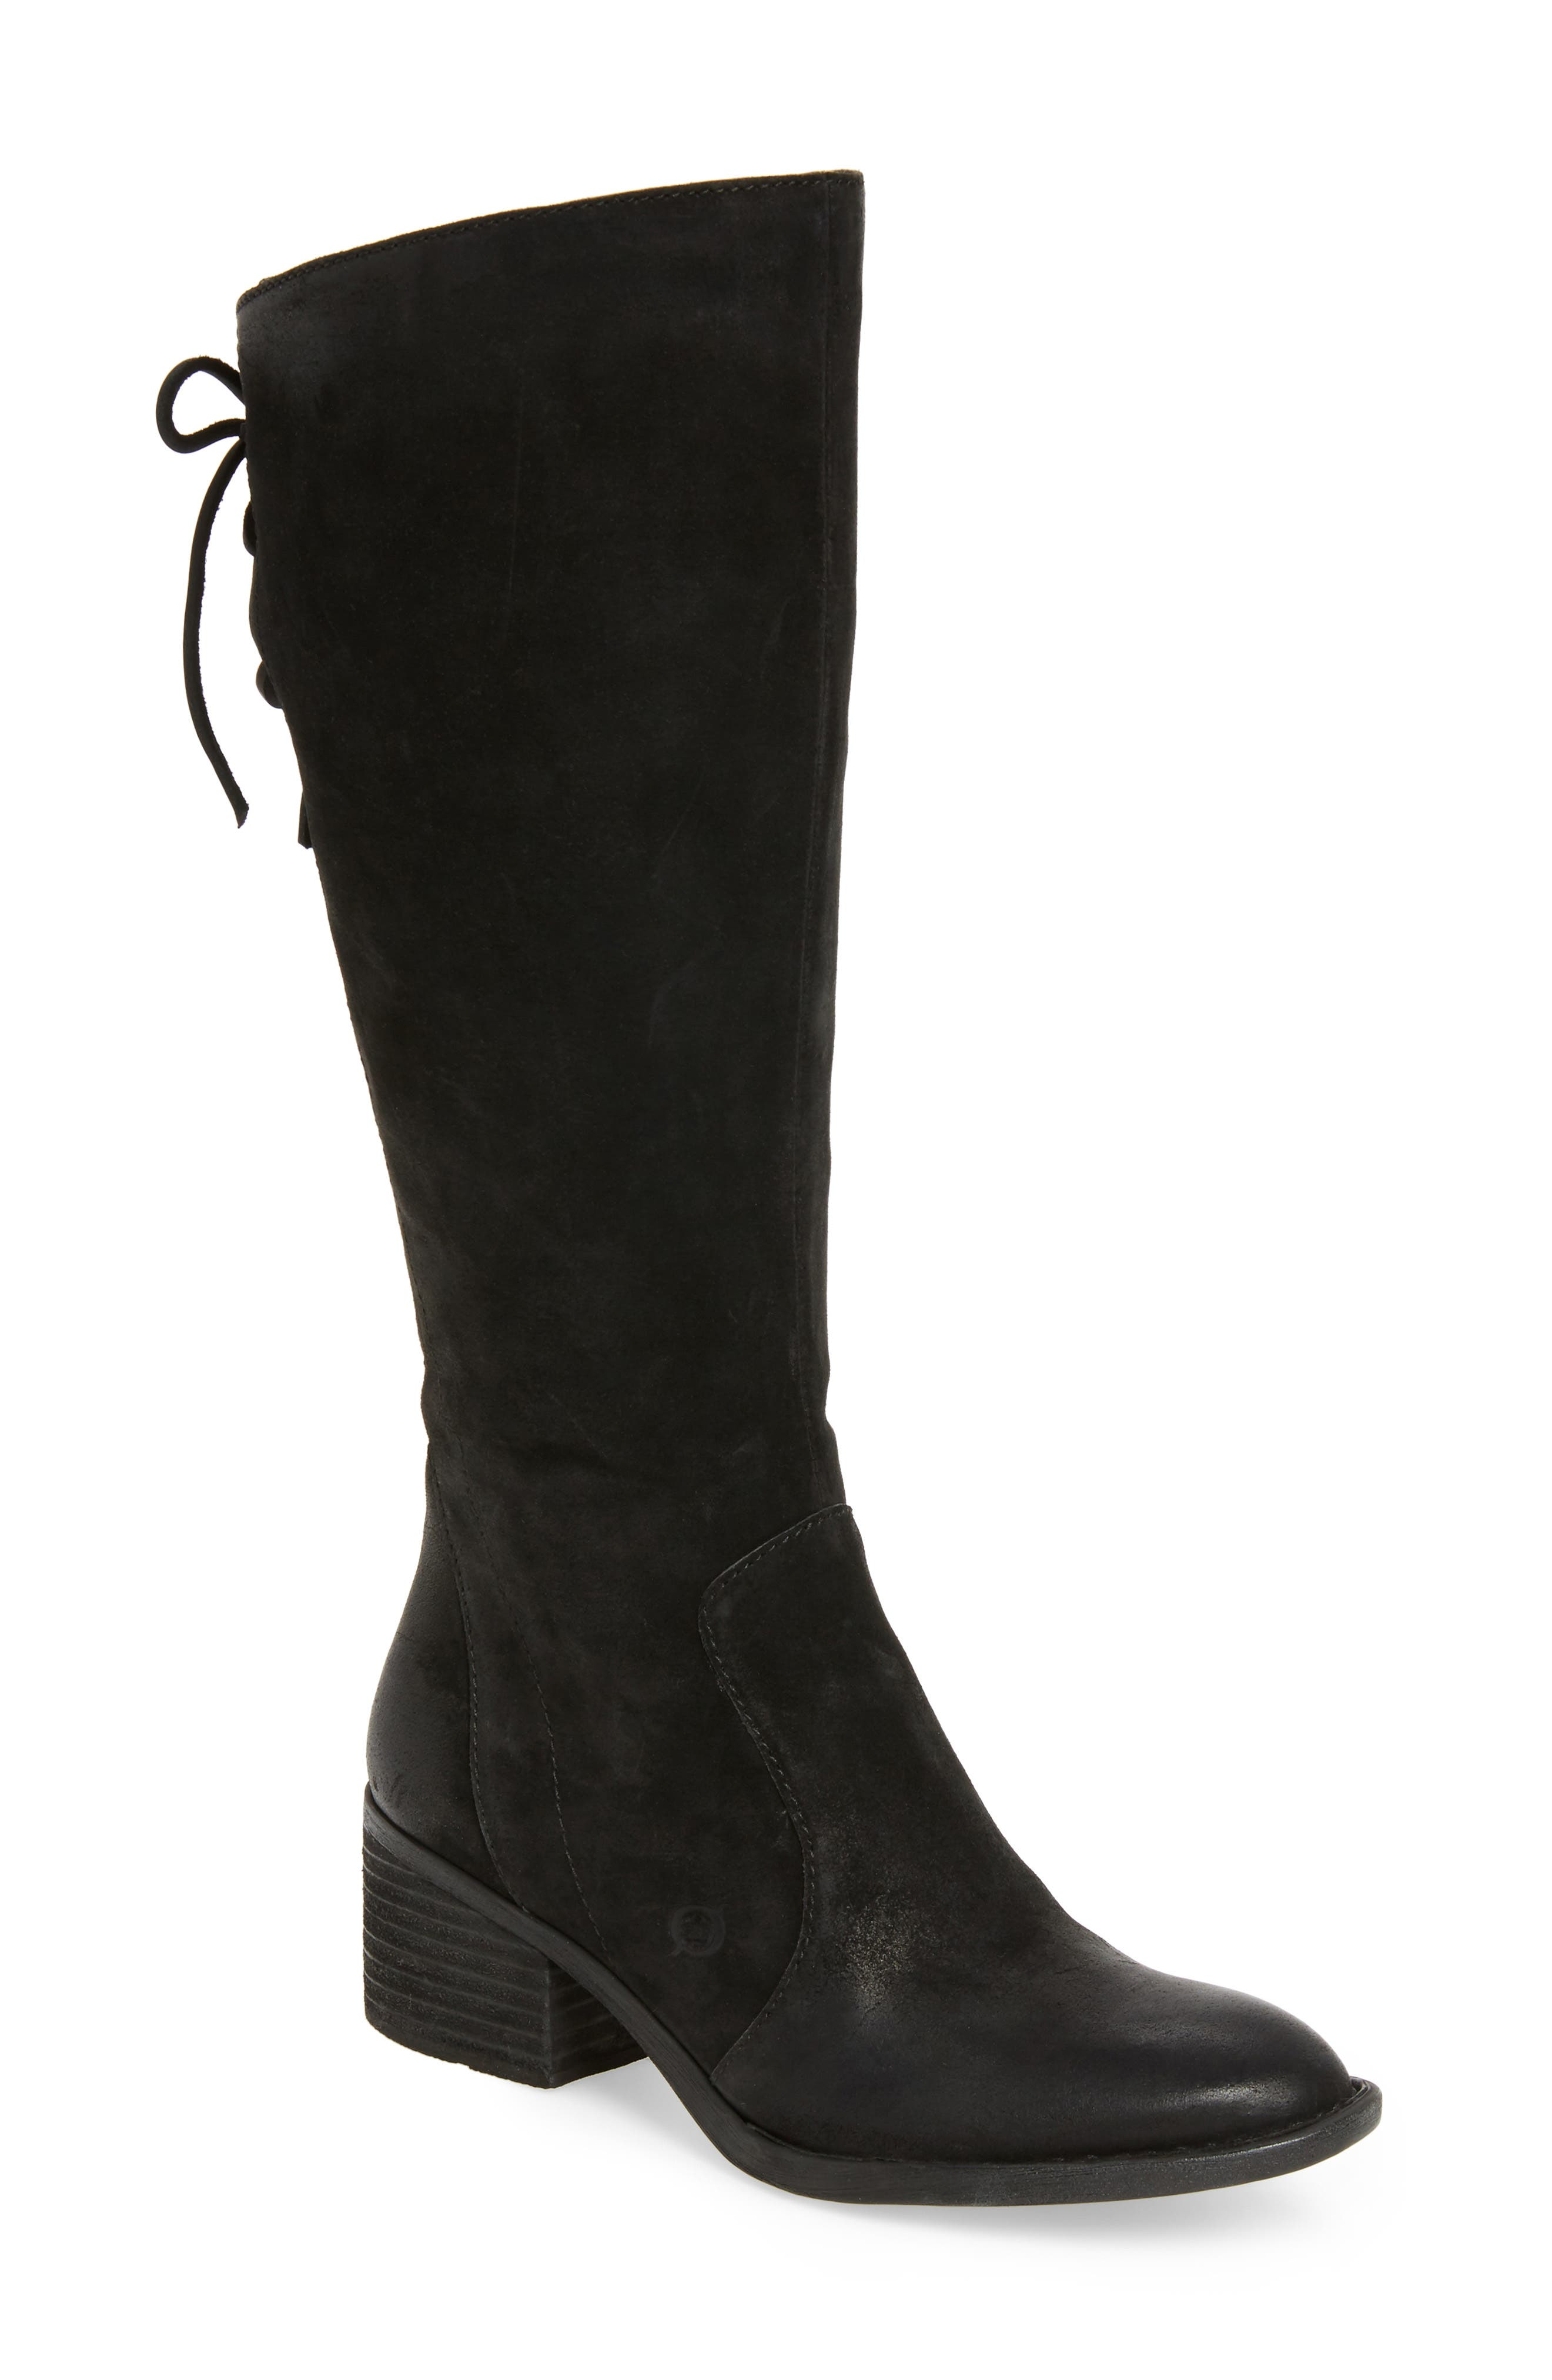 B?rn Felicia Knee High Boot